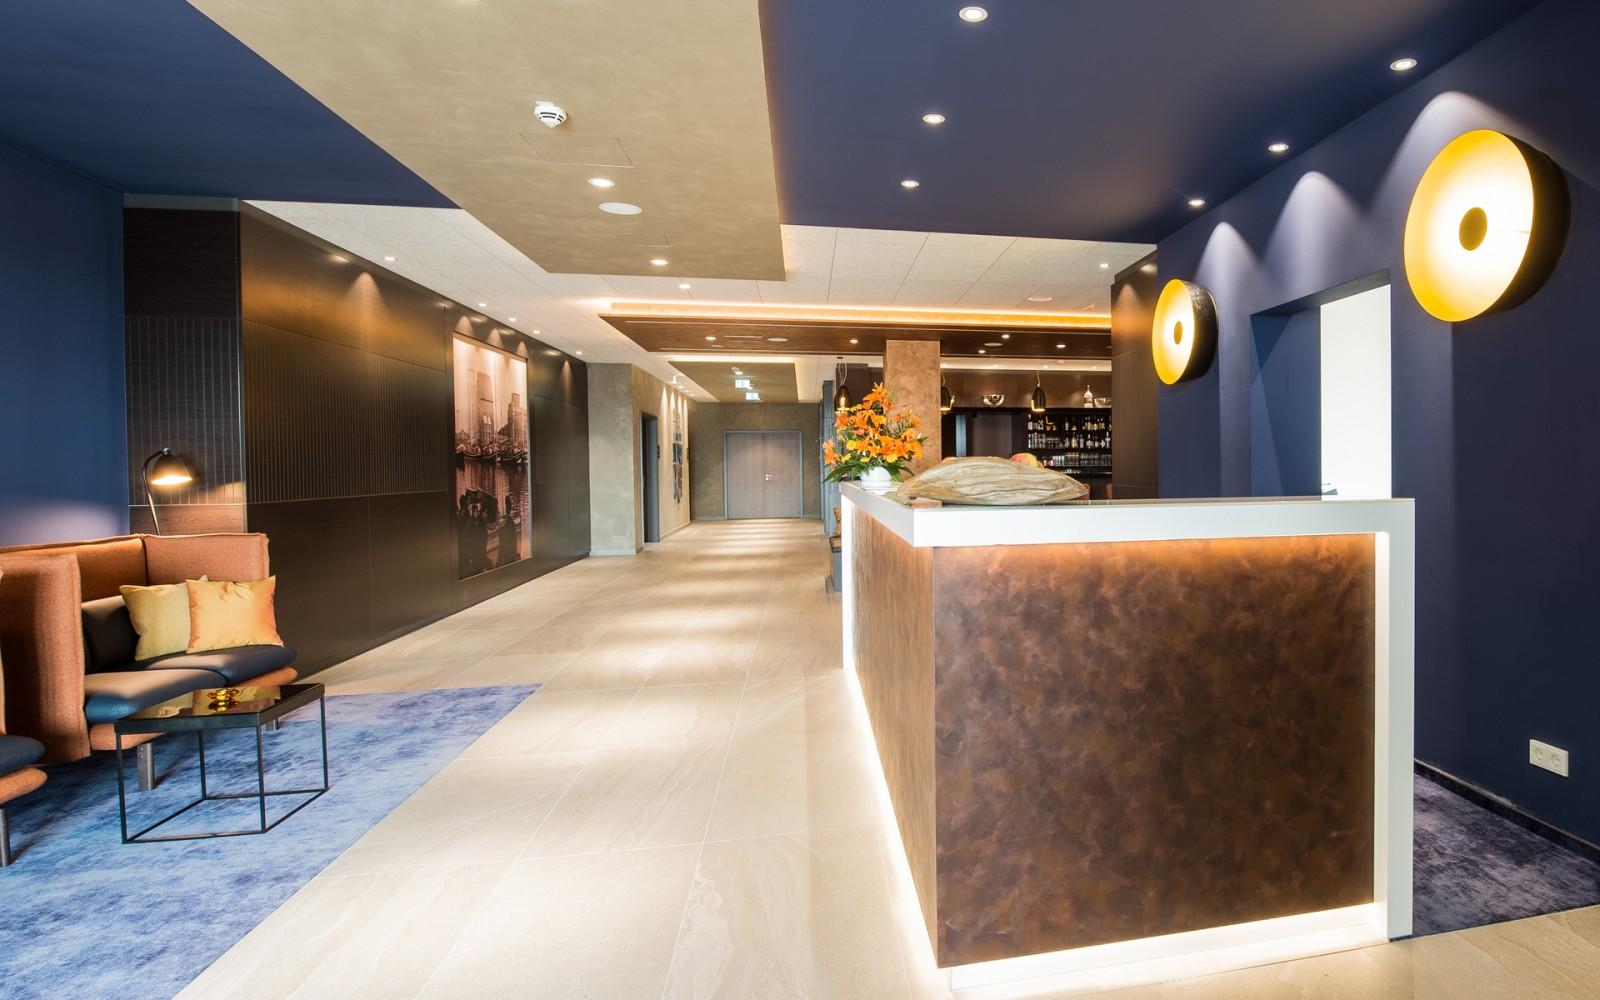 hotel_Meereszeiten_recepcija_reception_lobby_1